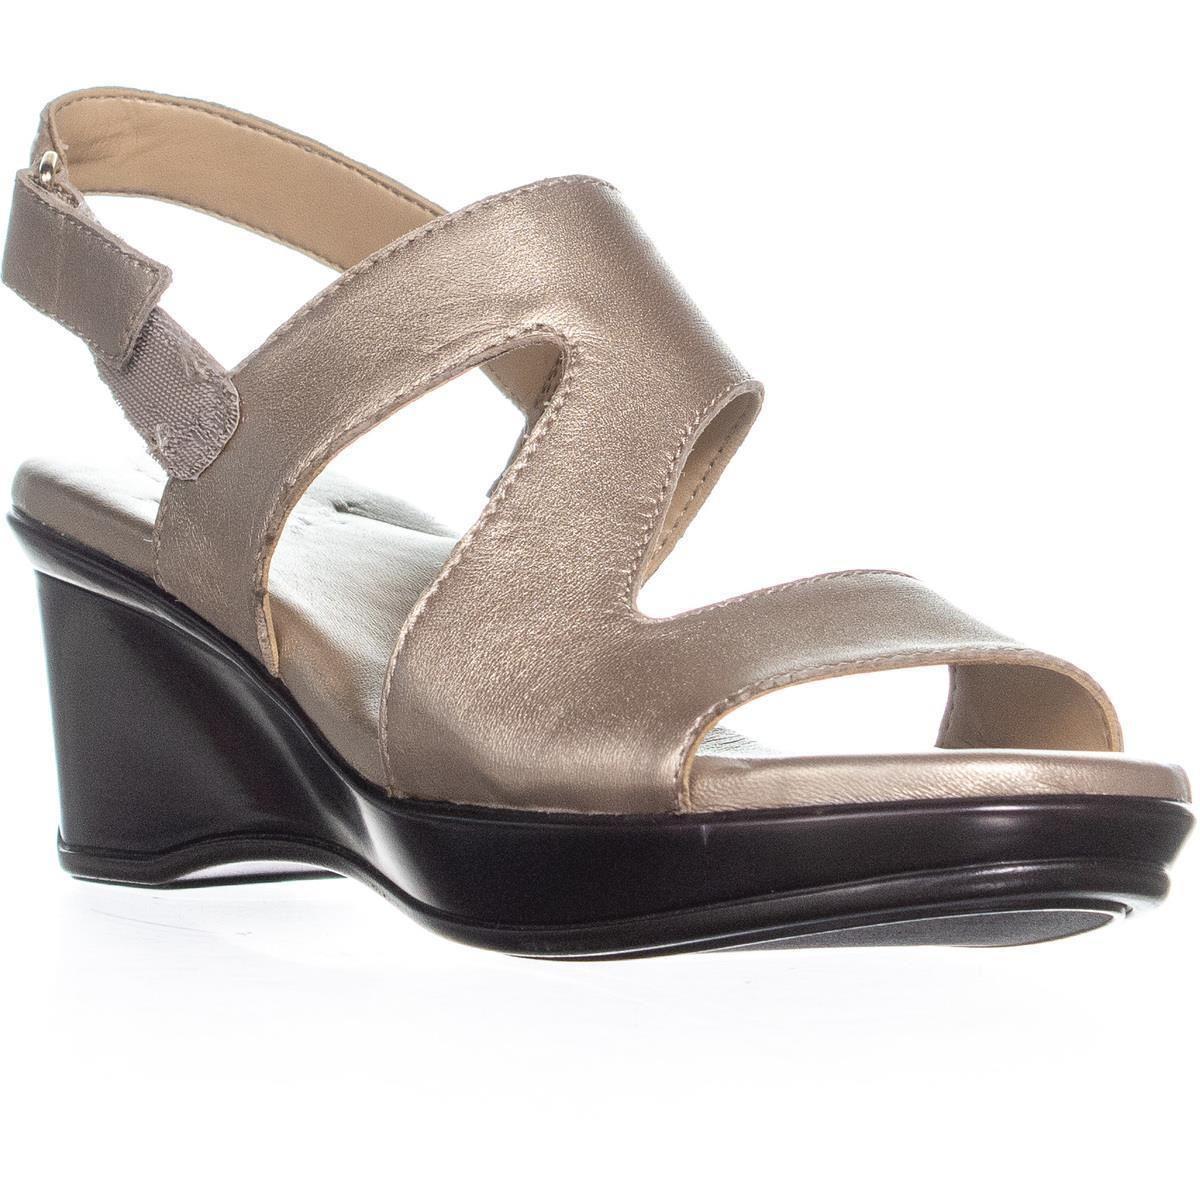 0b29fba6f423 Naturalizer. Women s Valerie Wedge Sandals ...